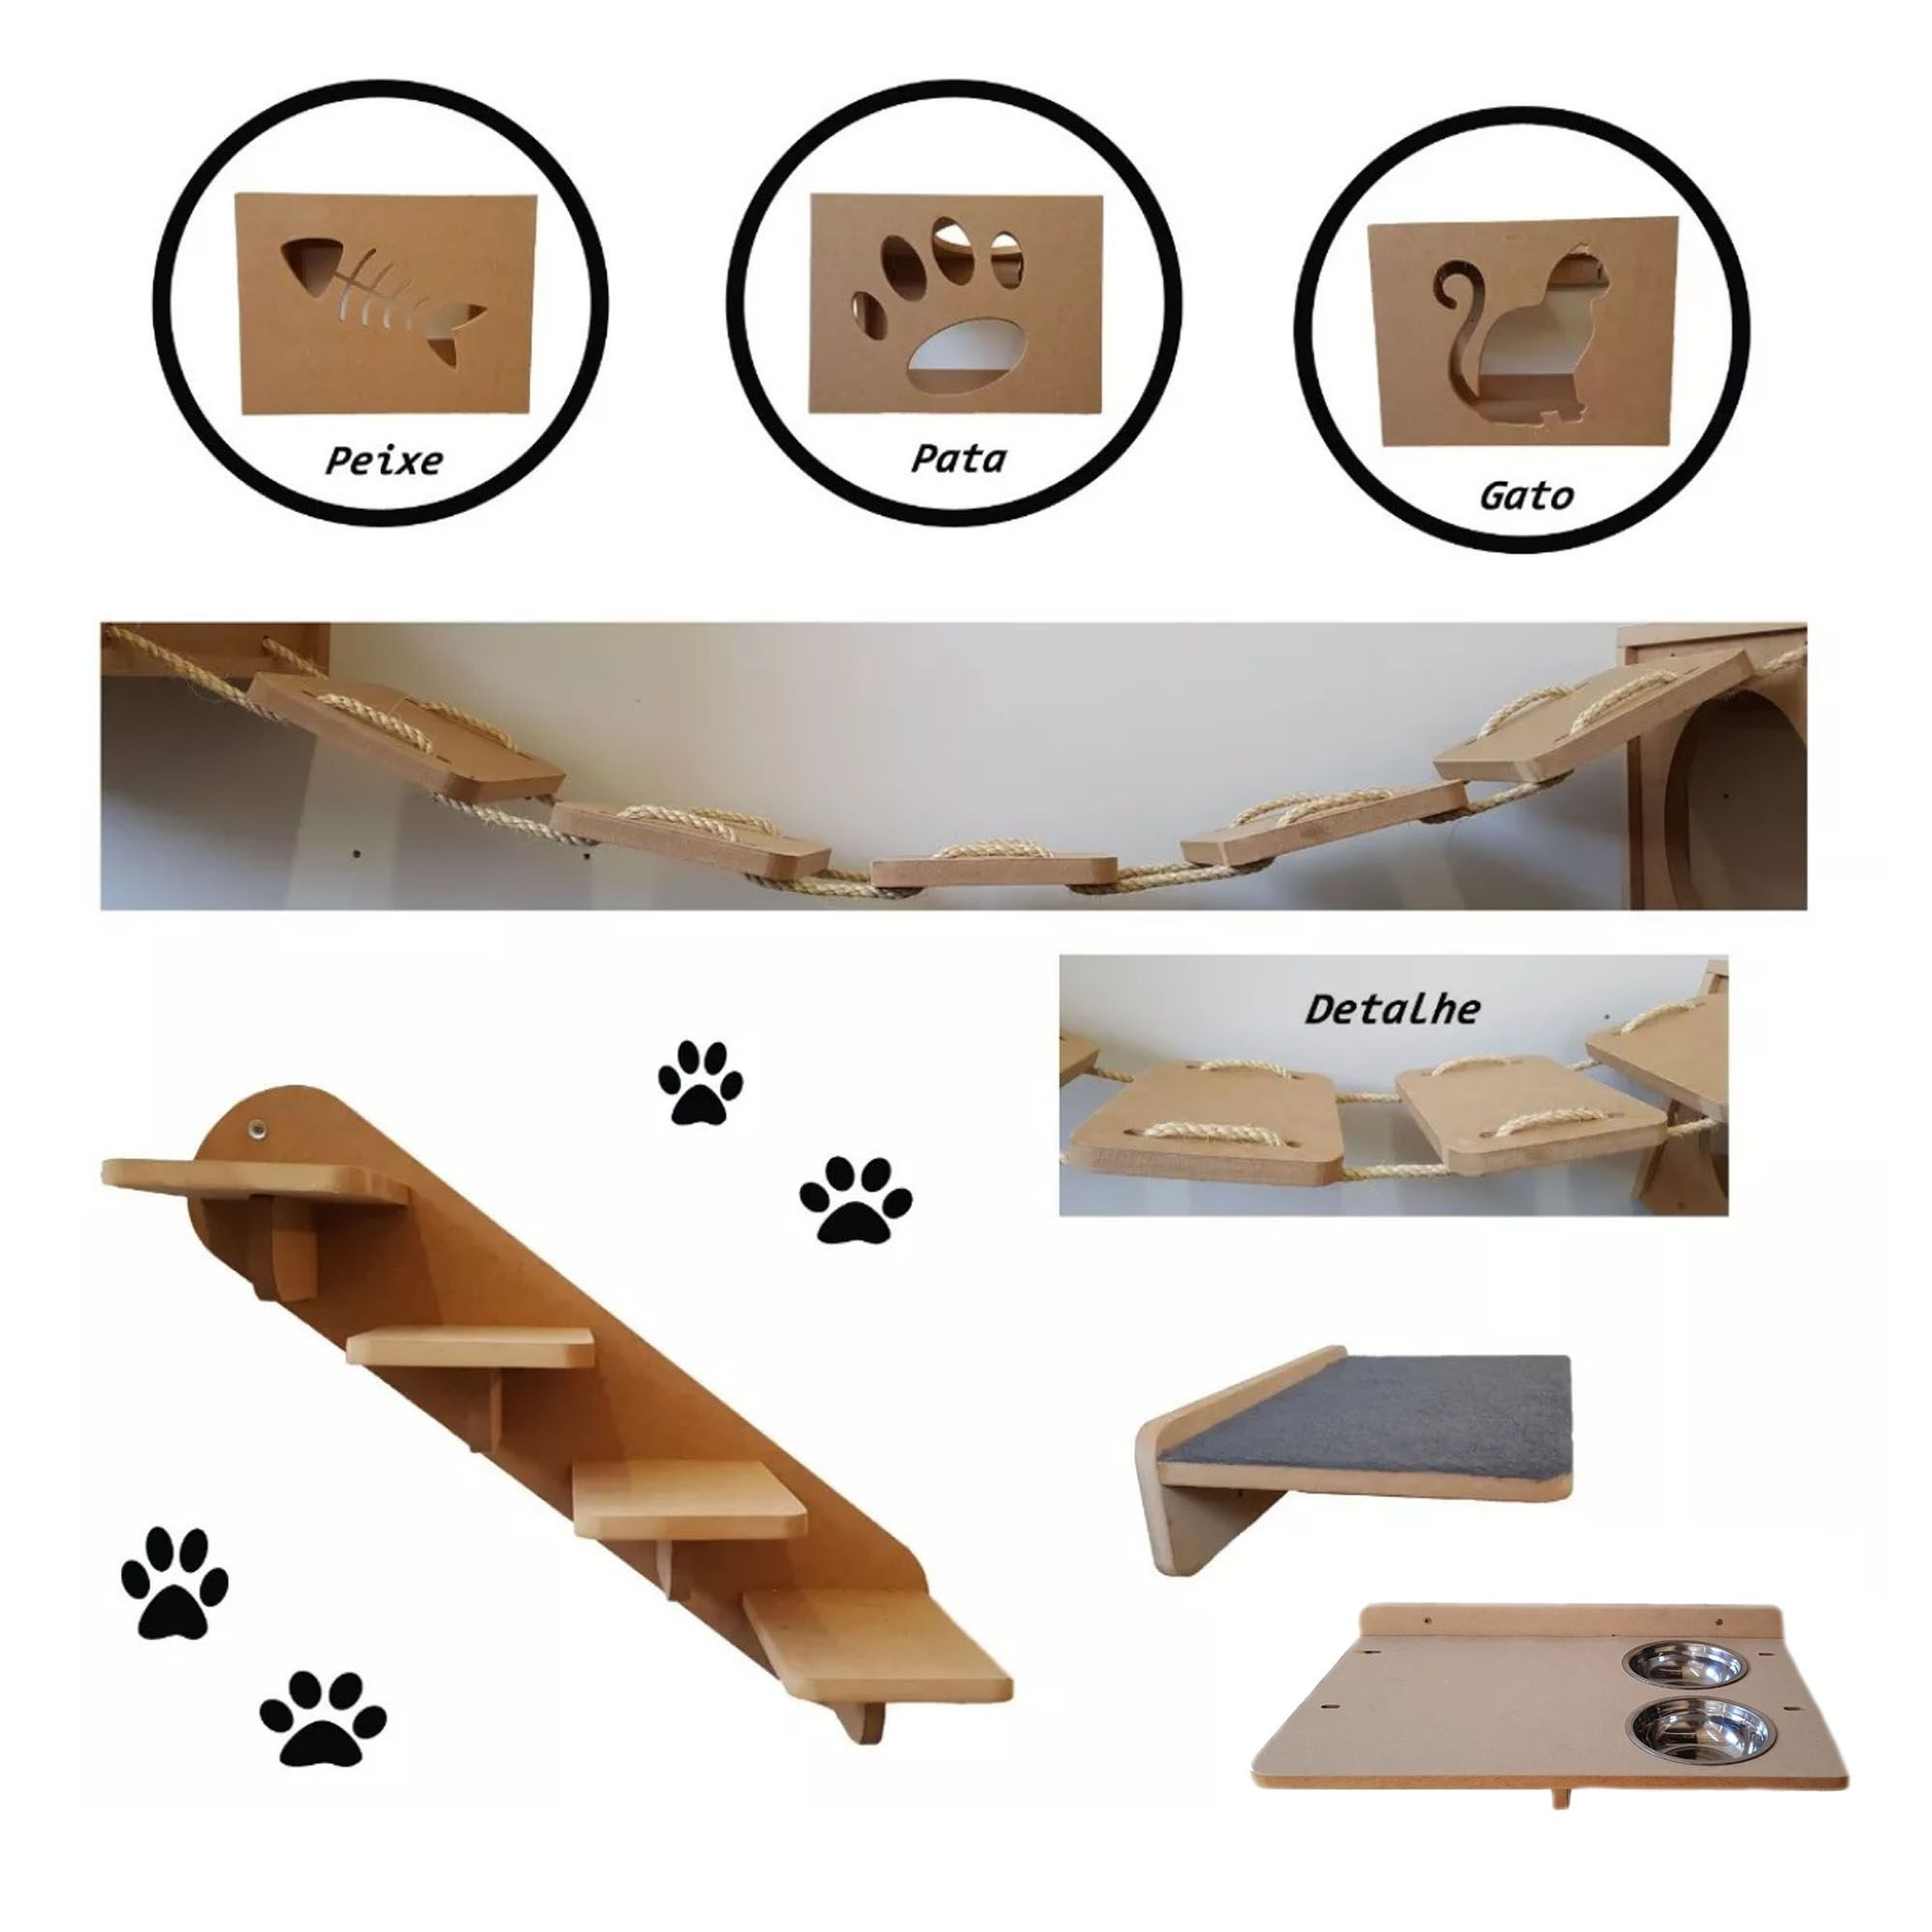 Nicho Gato - Kit Nicho para Gato 7 Peças = 3 Nichos + Comedouro Suspenso Duplo + Prateleira + Escada + Ponte Gato Mdf 15mm